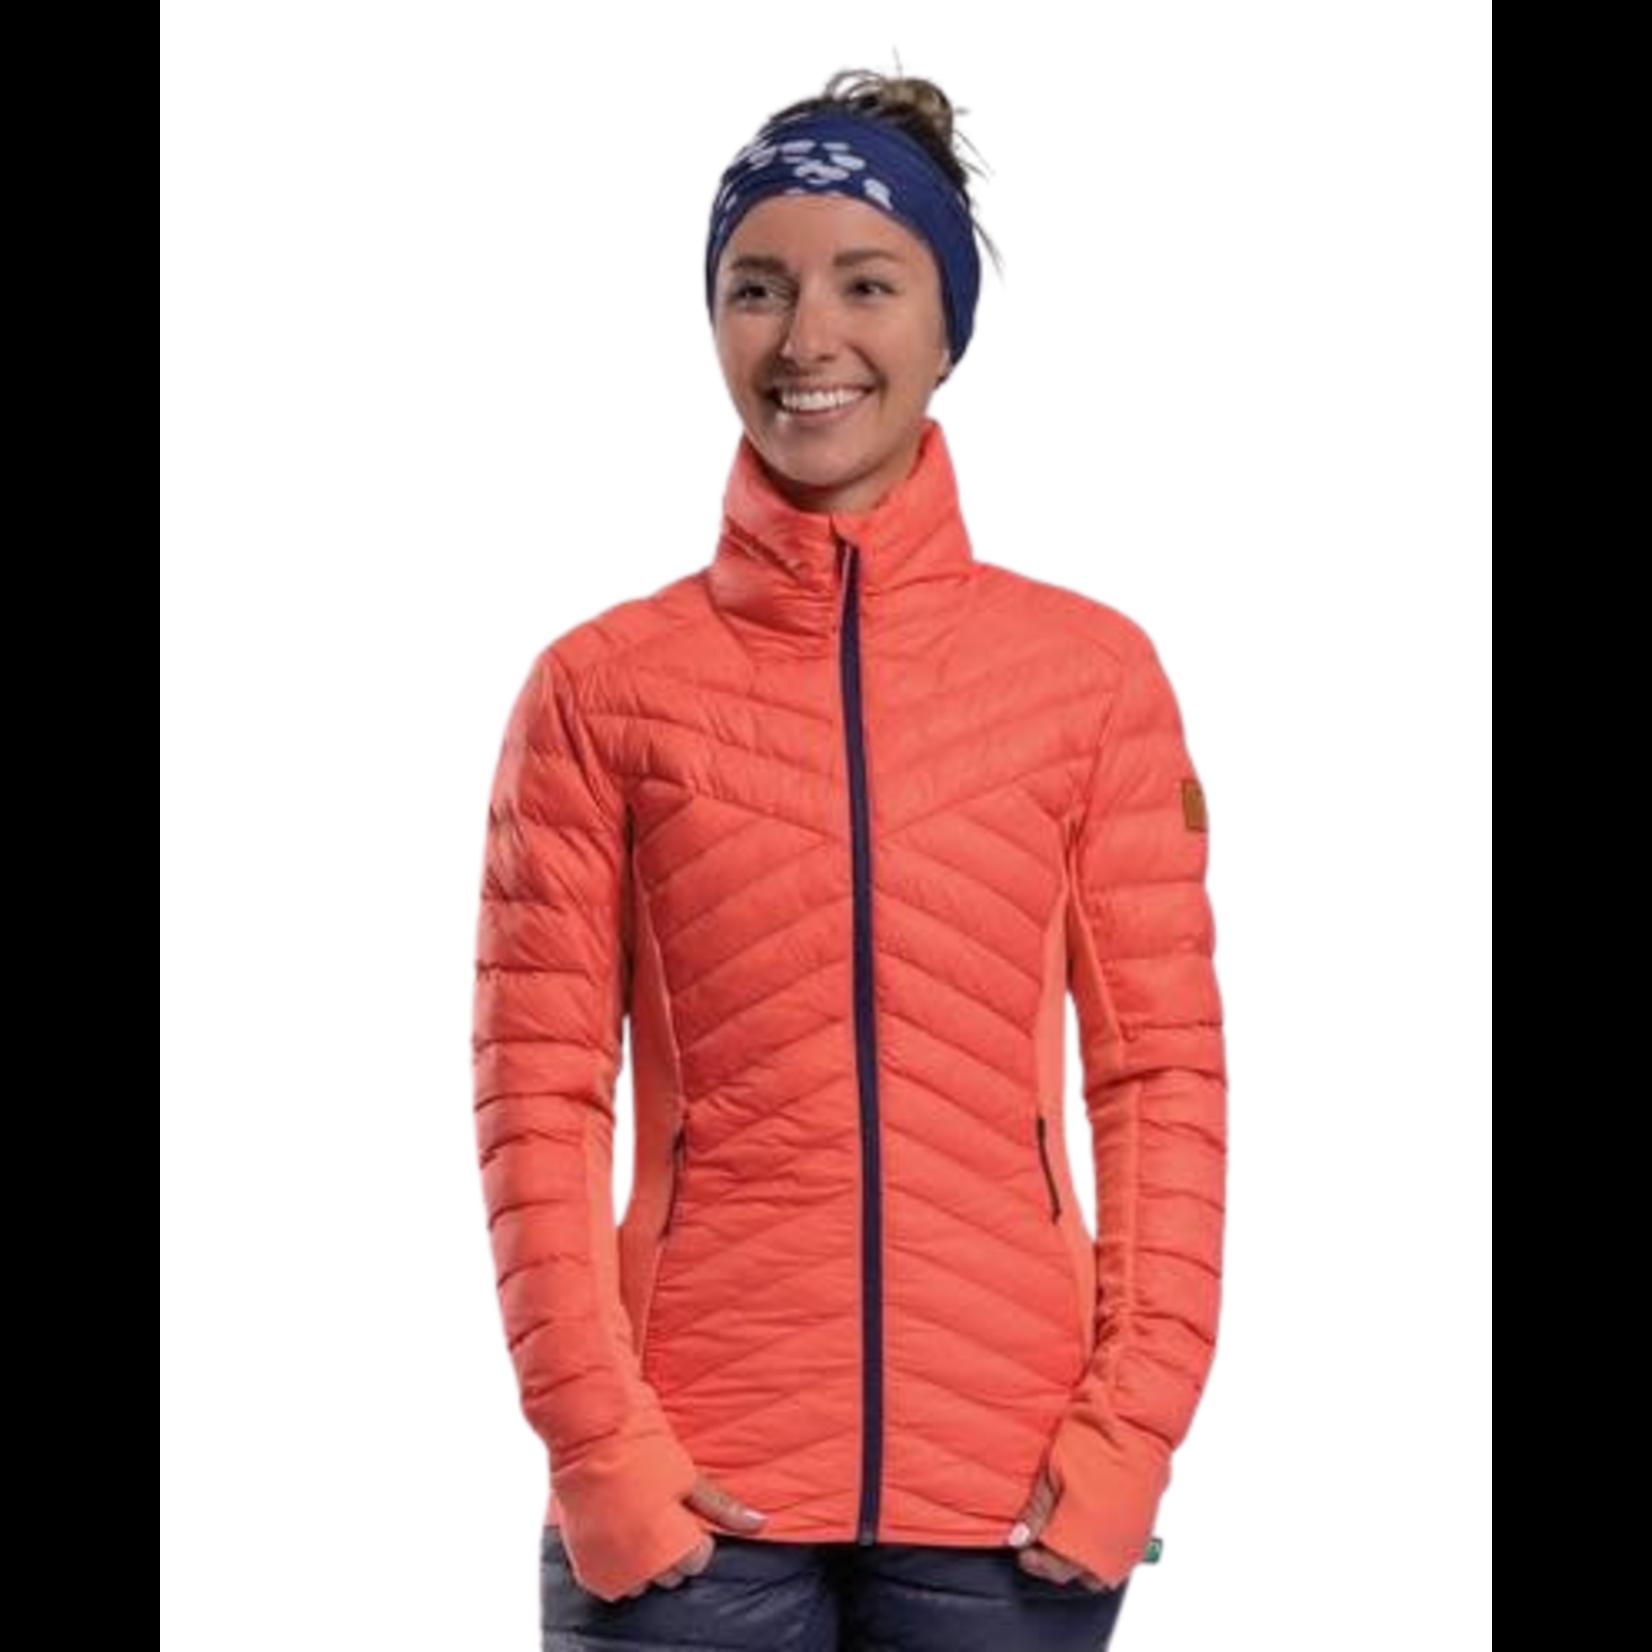 Peppermint Peppermint Chalet Hybrid Jacket Women's